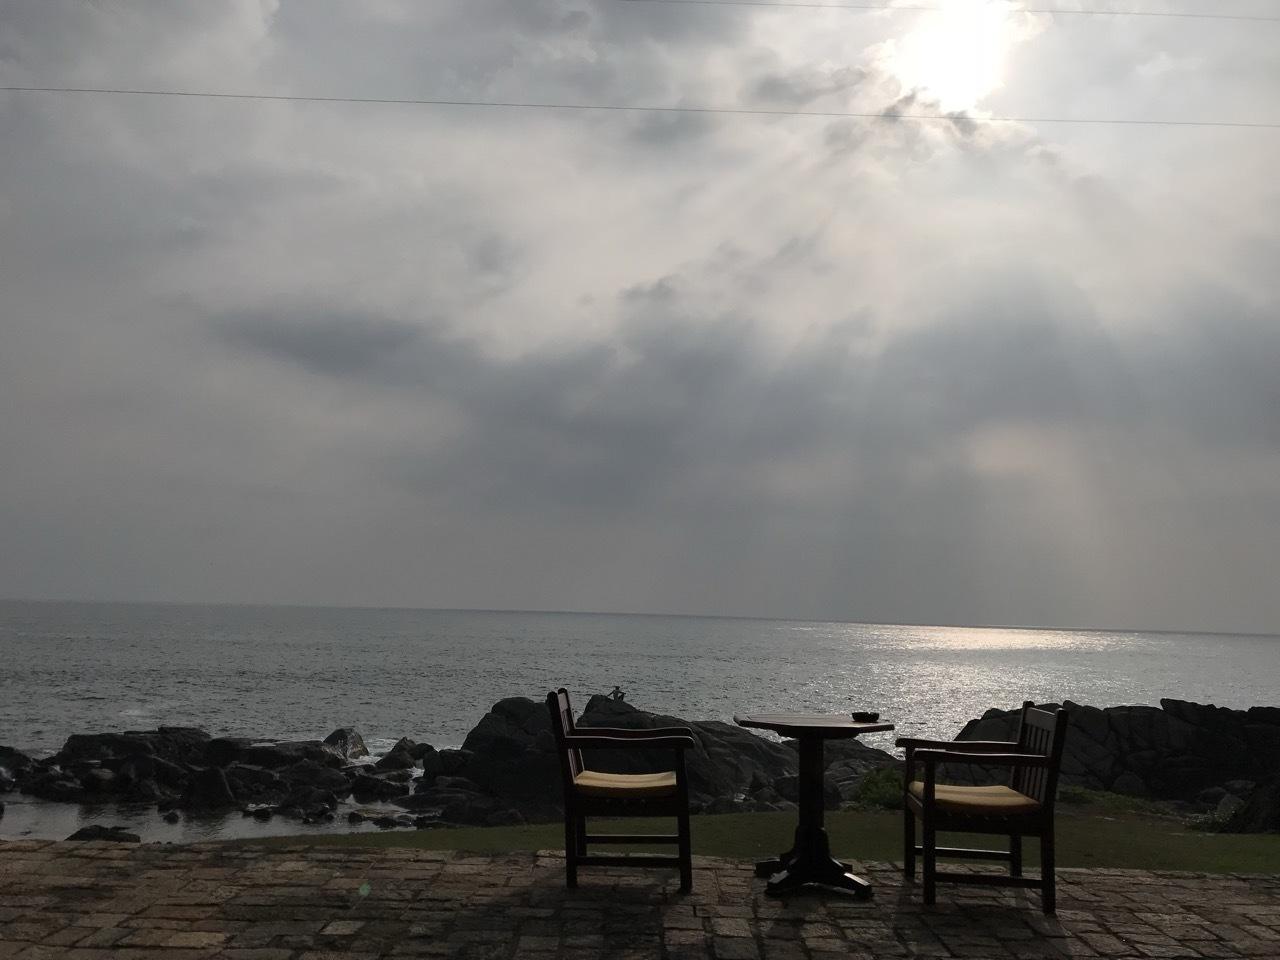 Sri Lanka 2018 (21)_f0170995_23171419.jpg